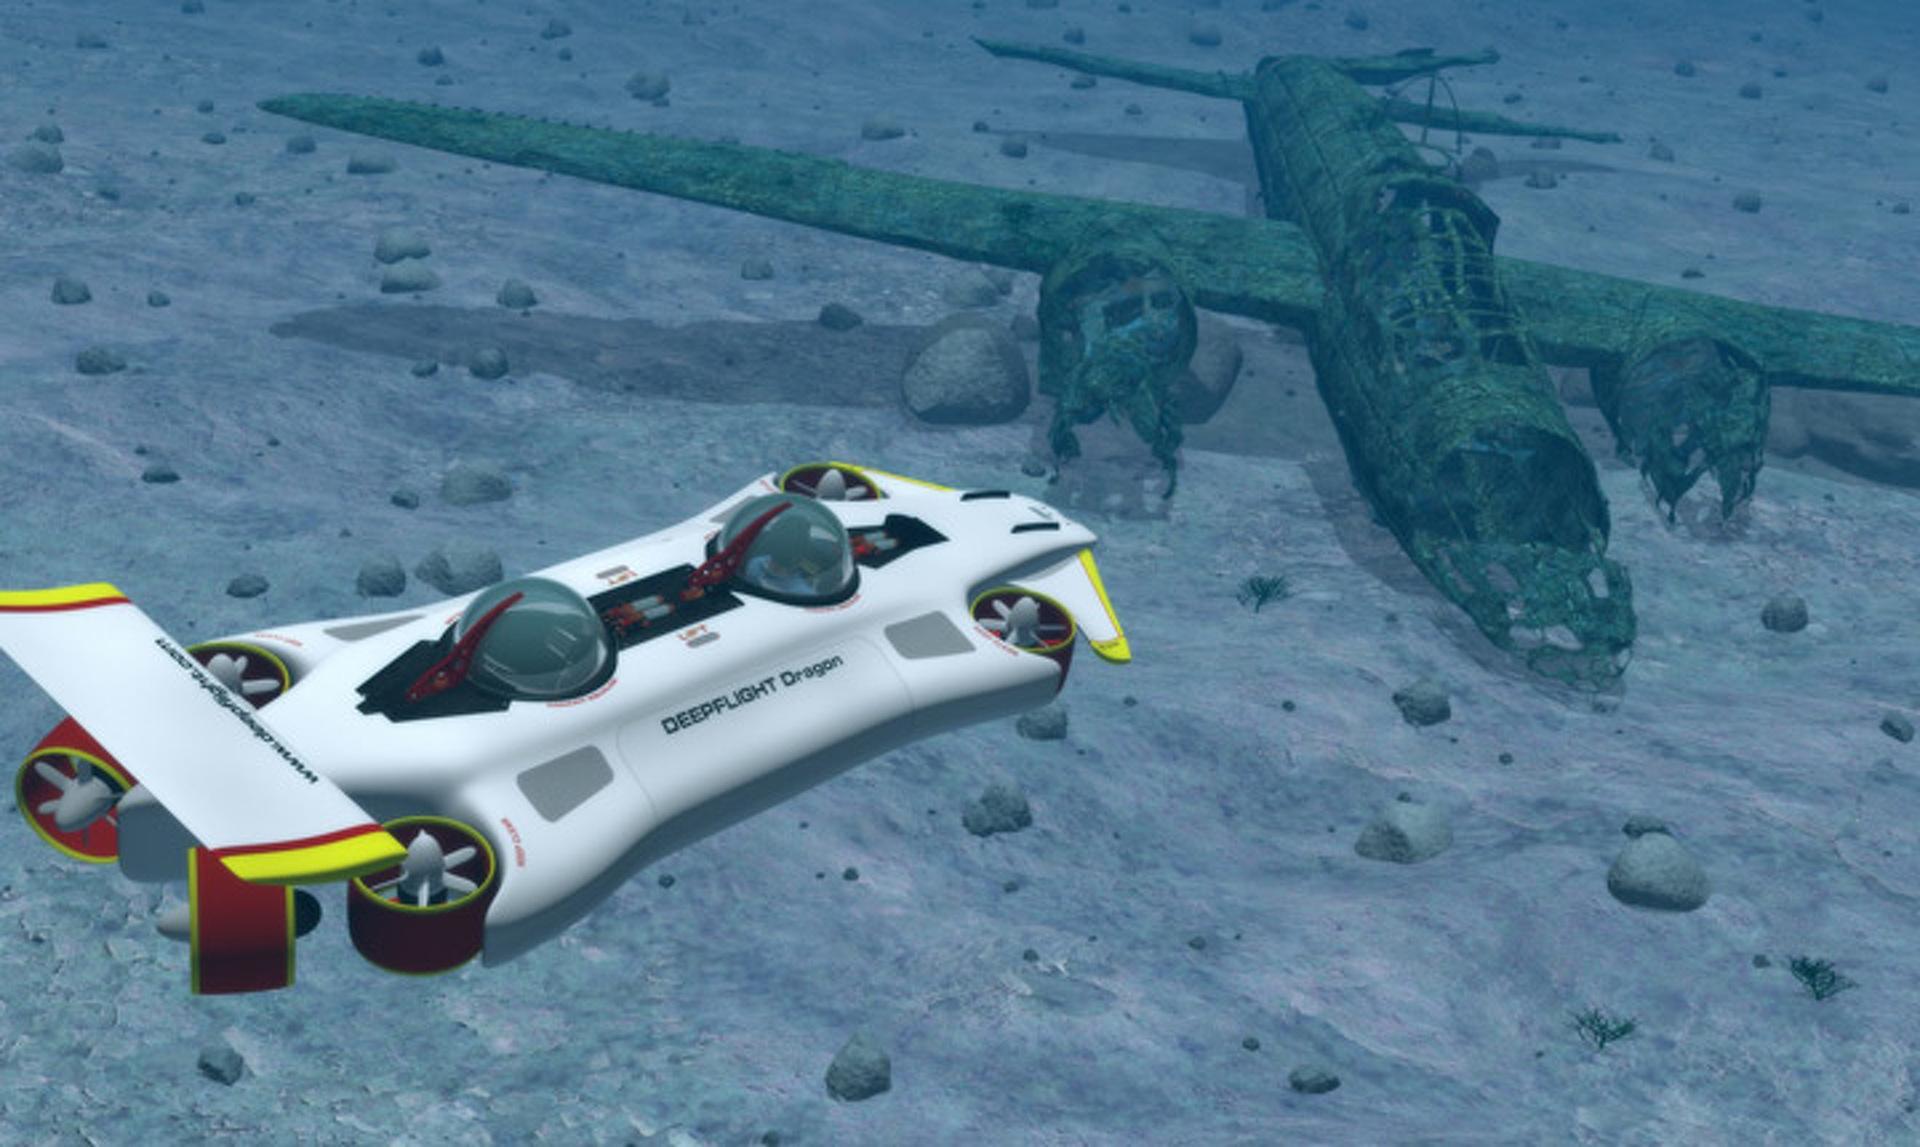 DeepFlight Dragon: A $1.5 Million Underwater Explorer